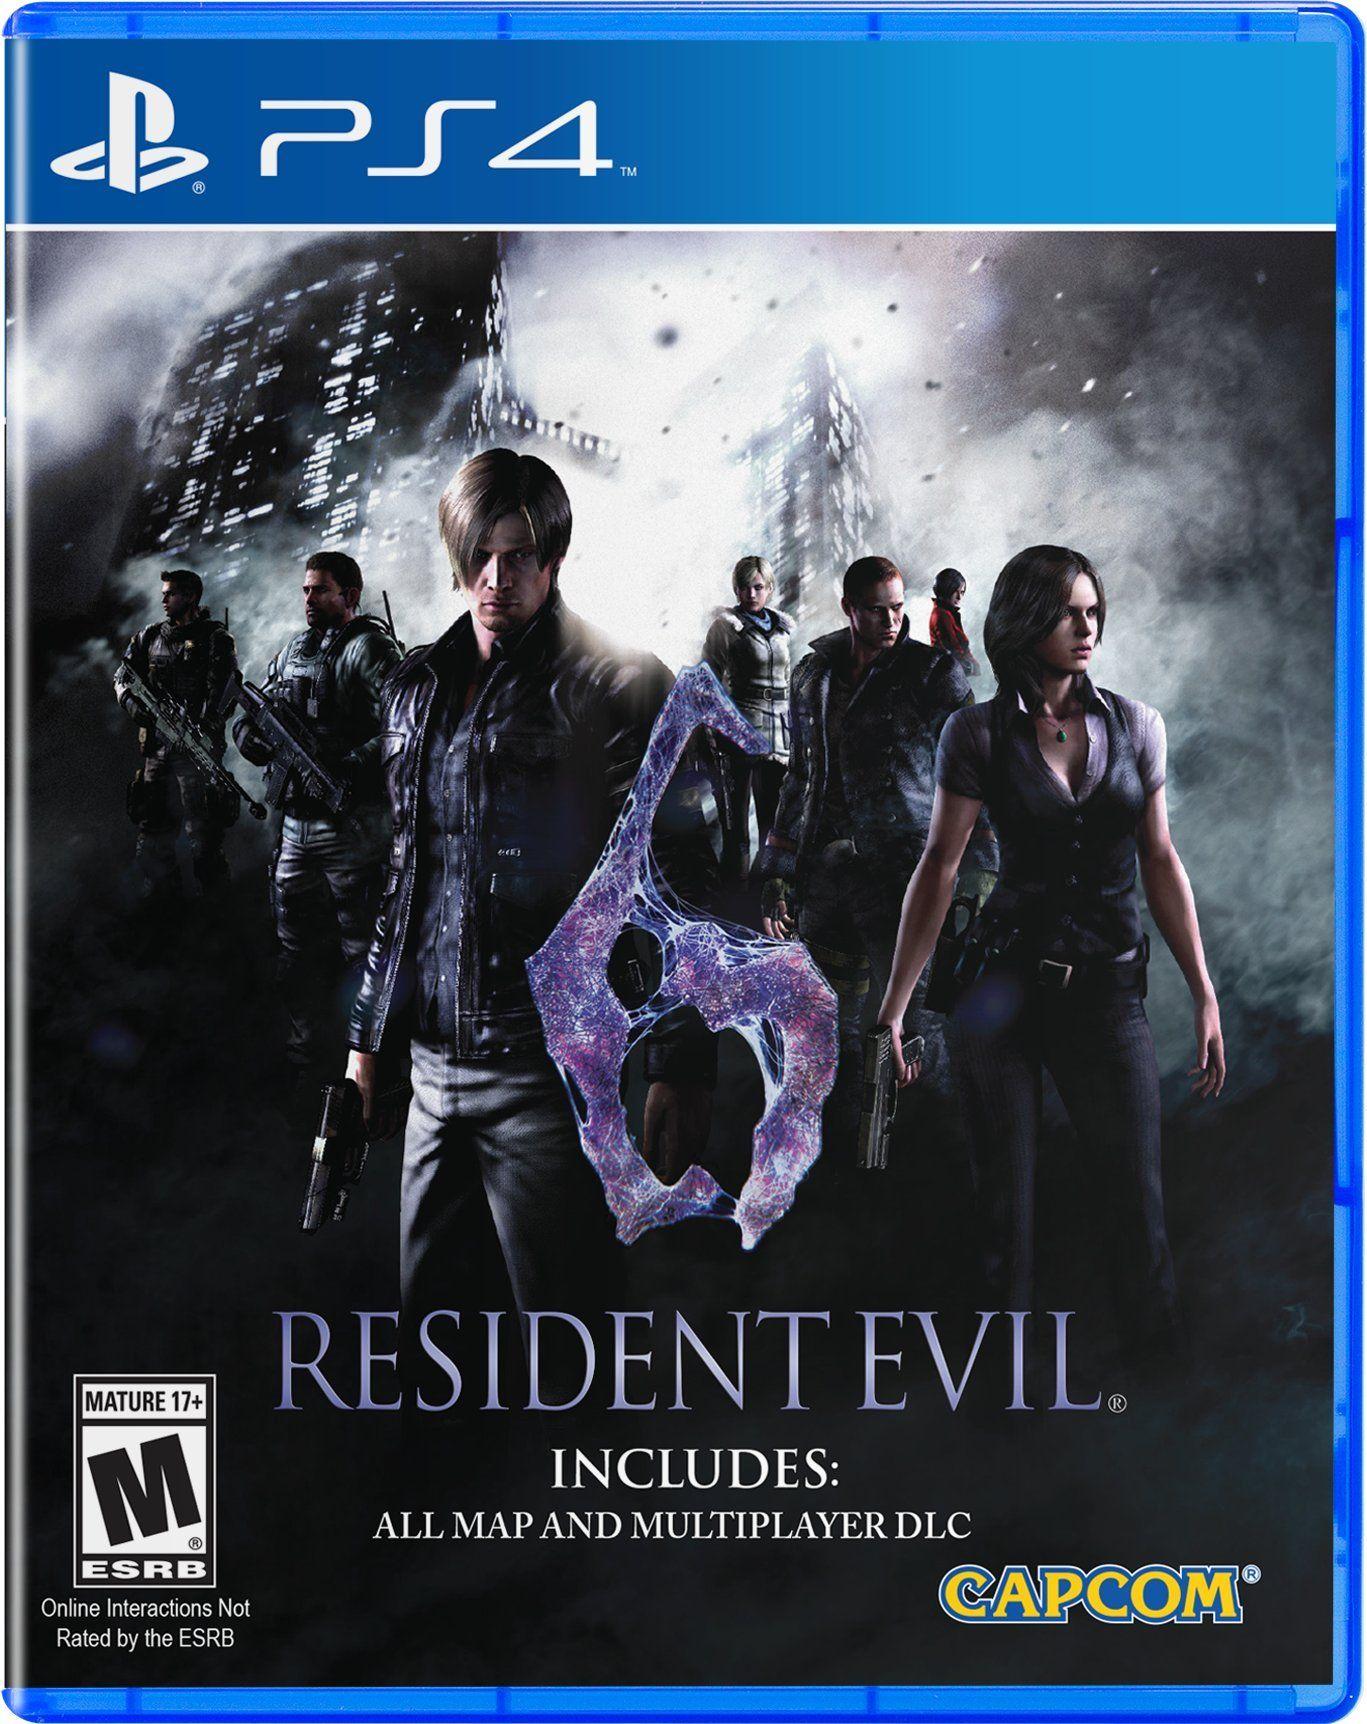 Resident Evil 6 Ps4 Pinterest Ada Wong And Xbox Revelations Region 3 English